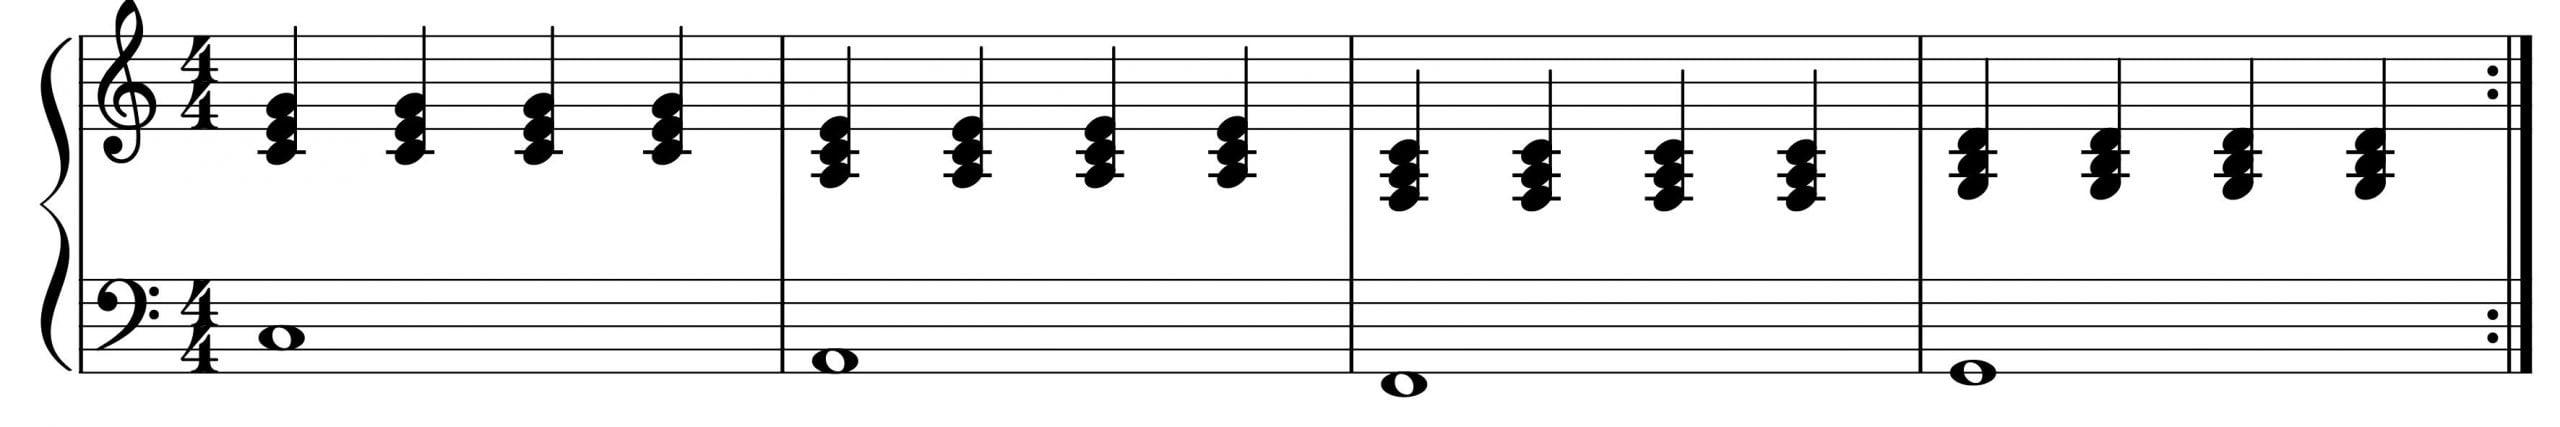 four chords in C plain